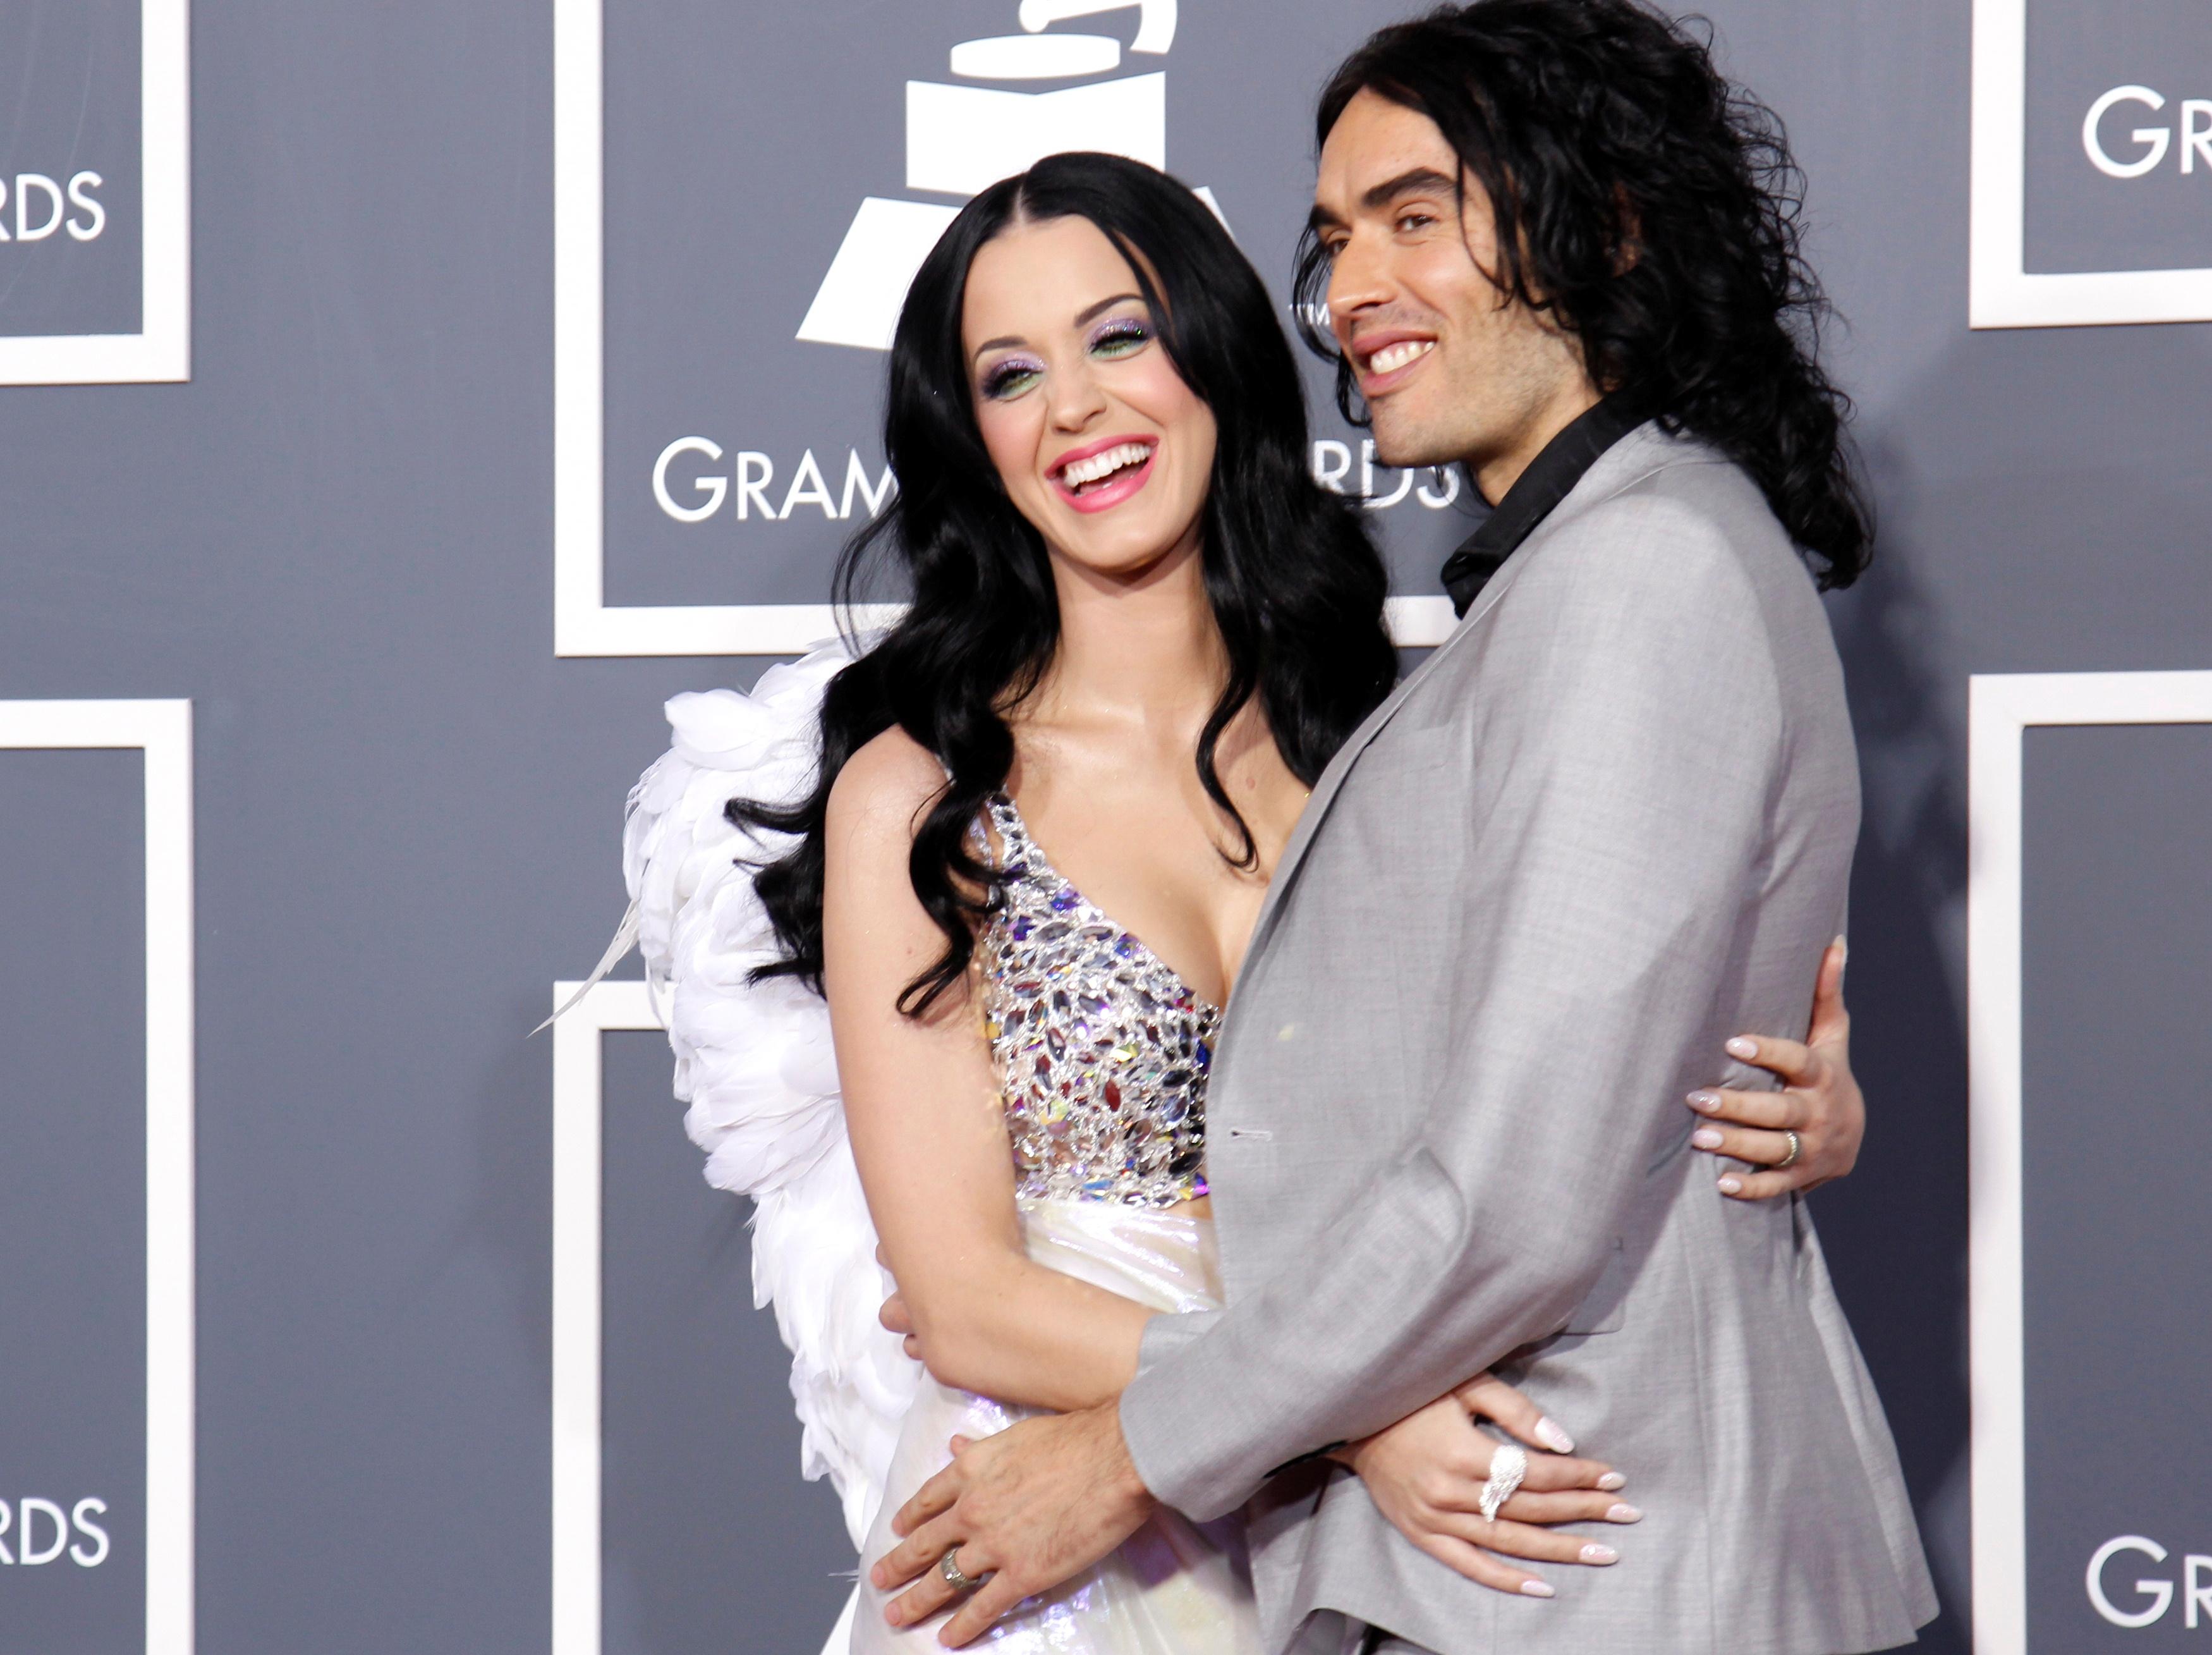 Katy Perry e Russell Brand: o casamento durou 14 meses